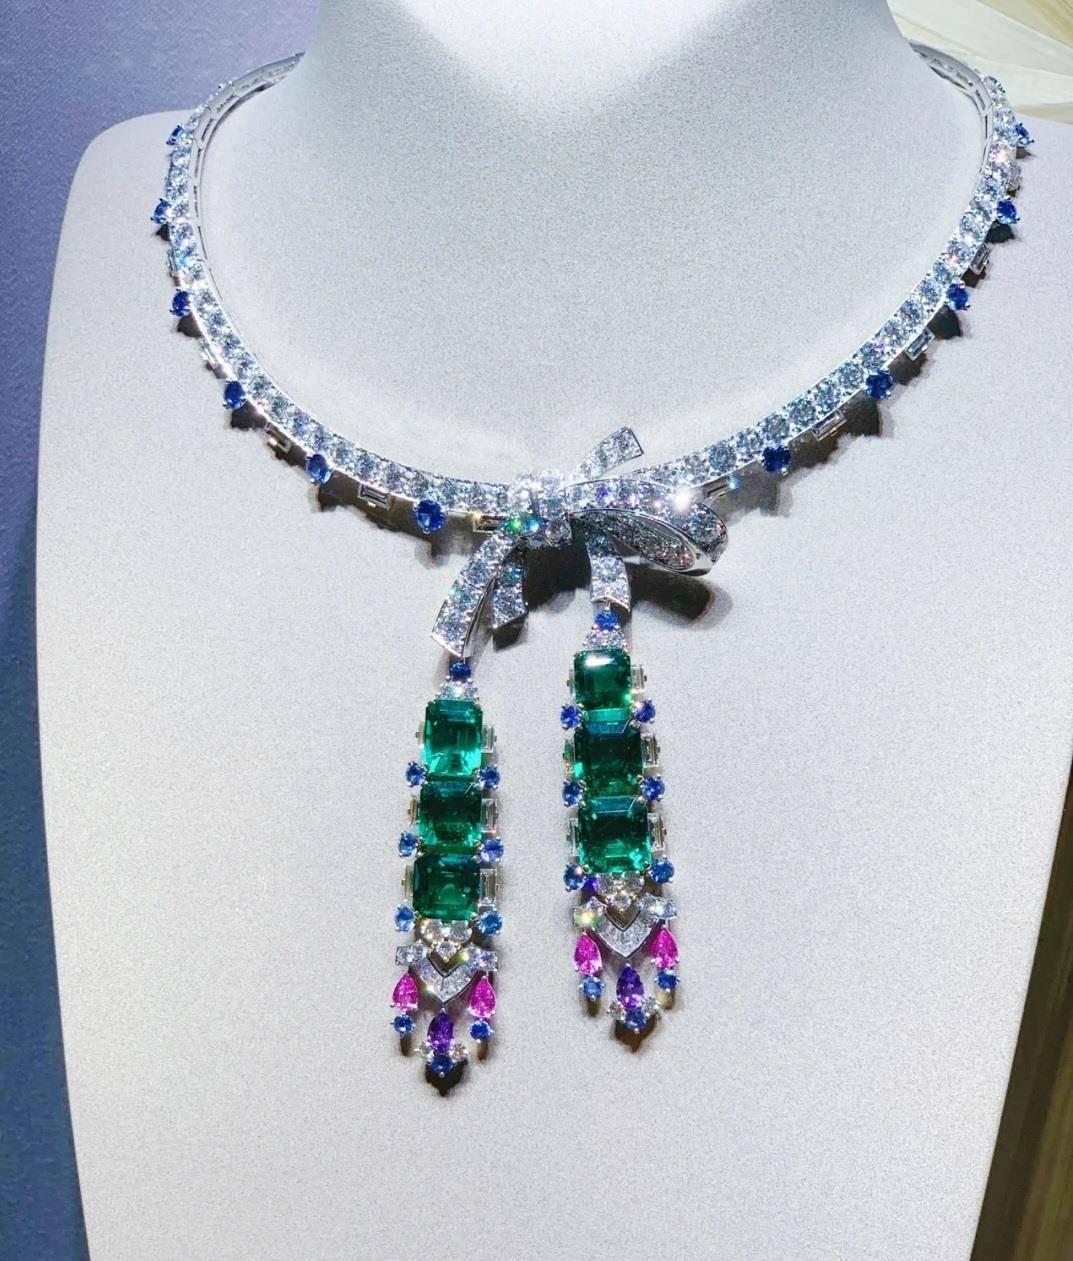 VanCleef&;Arpels高级珠宝超出珠宝本身的艺术享受